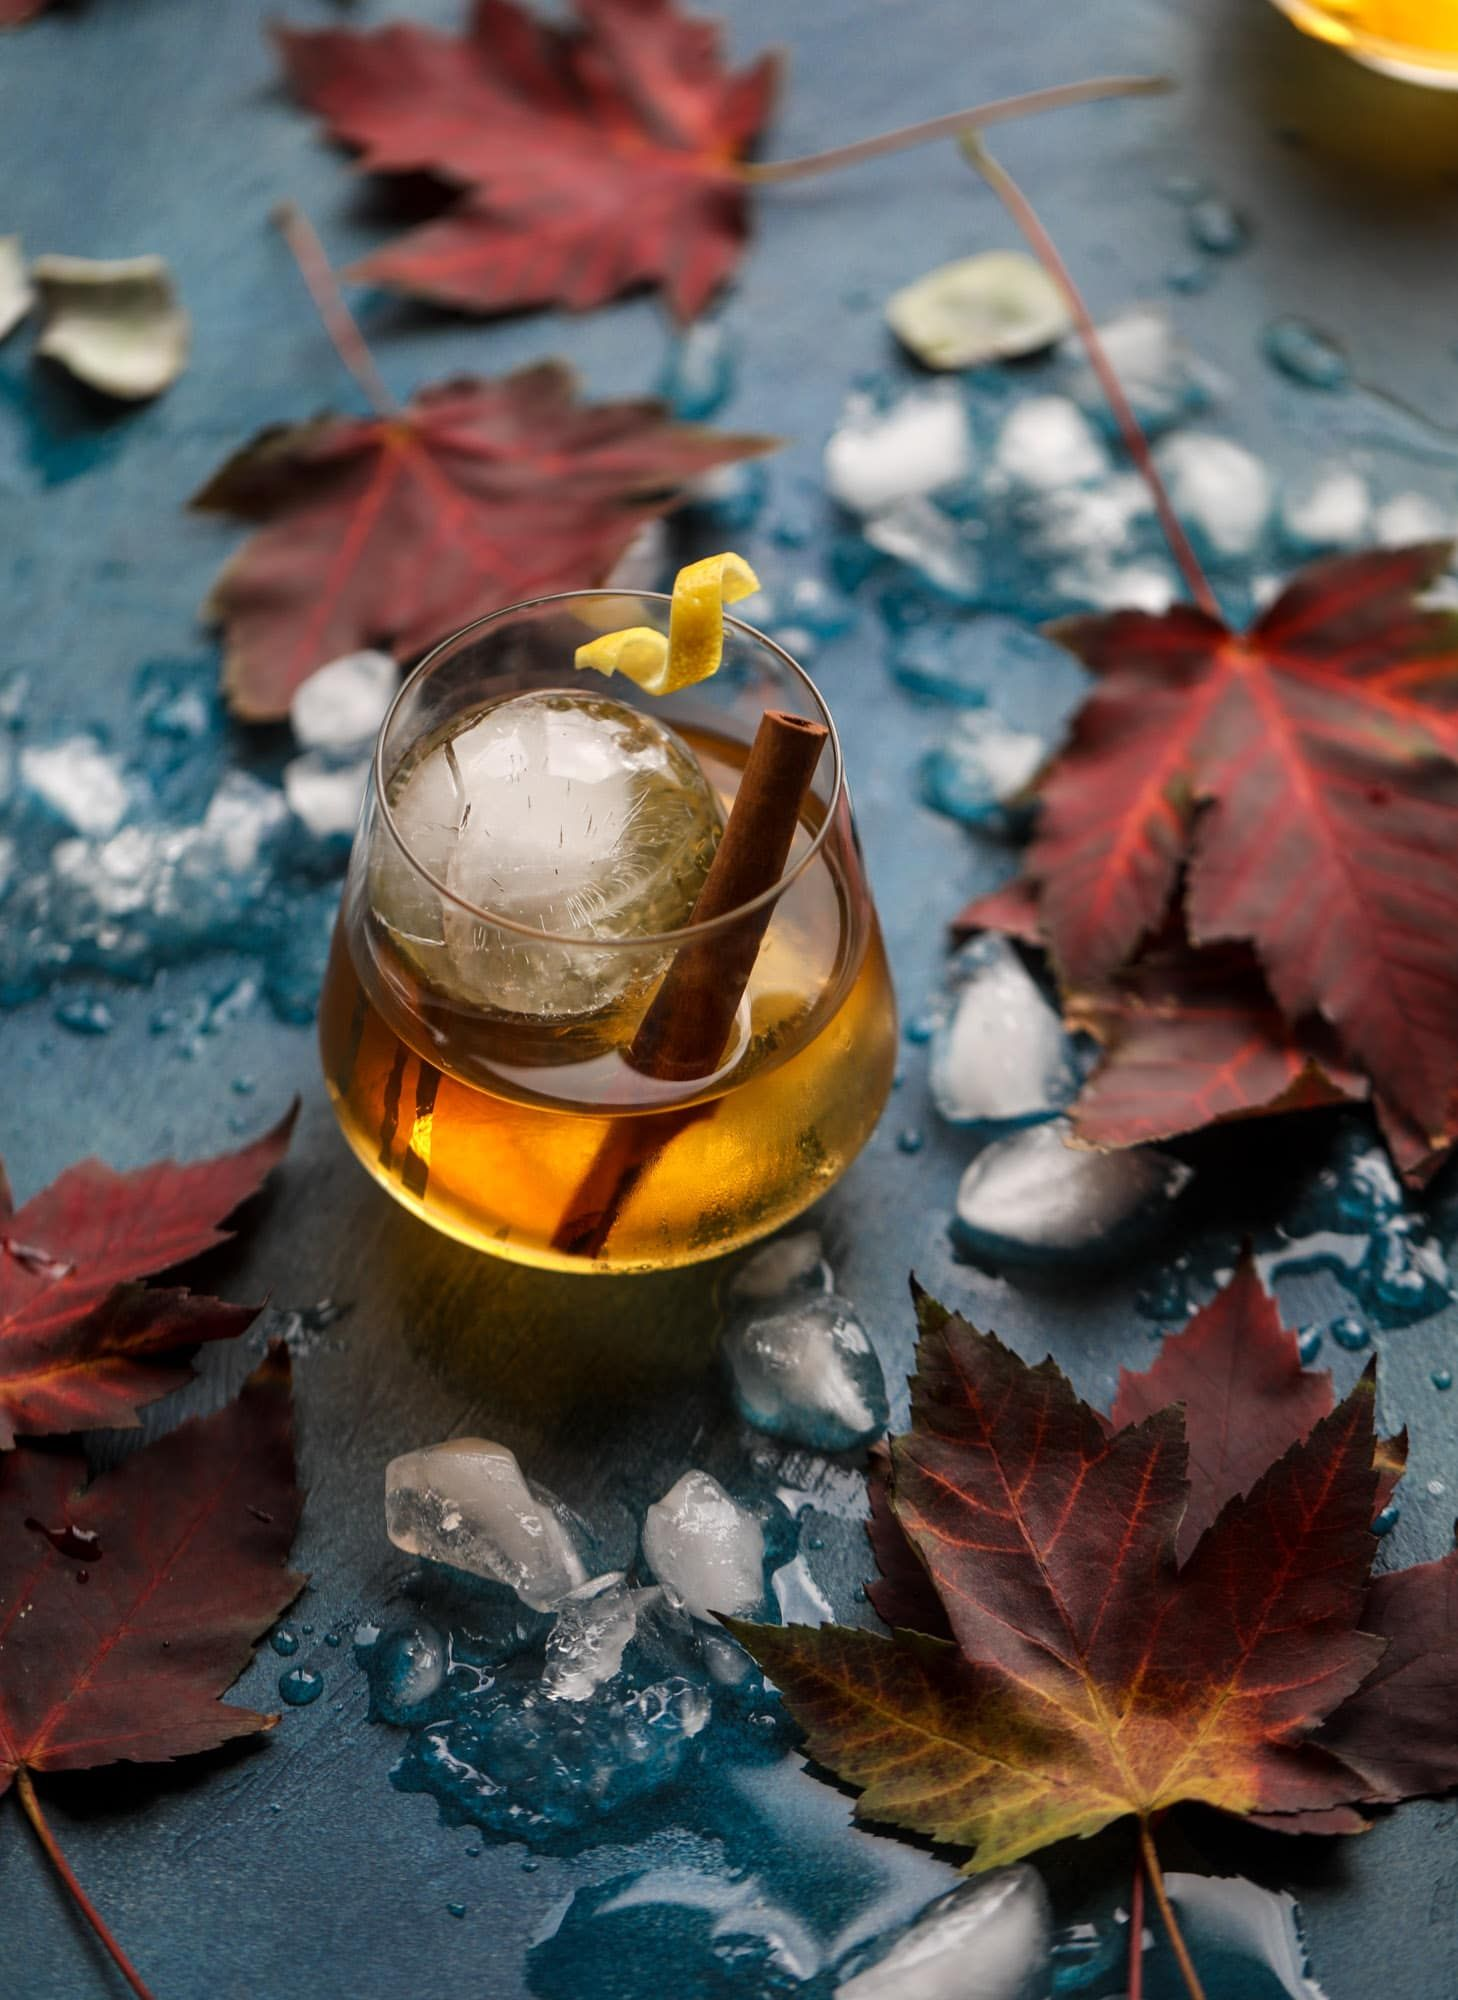 Smoked Maple Old Fashioned - Maple Old Fashioned Recipe #falldrinks